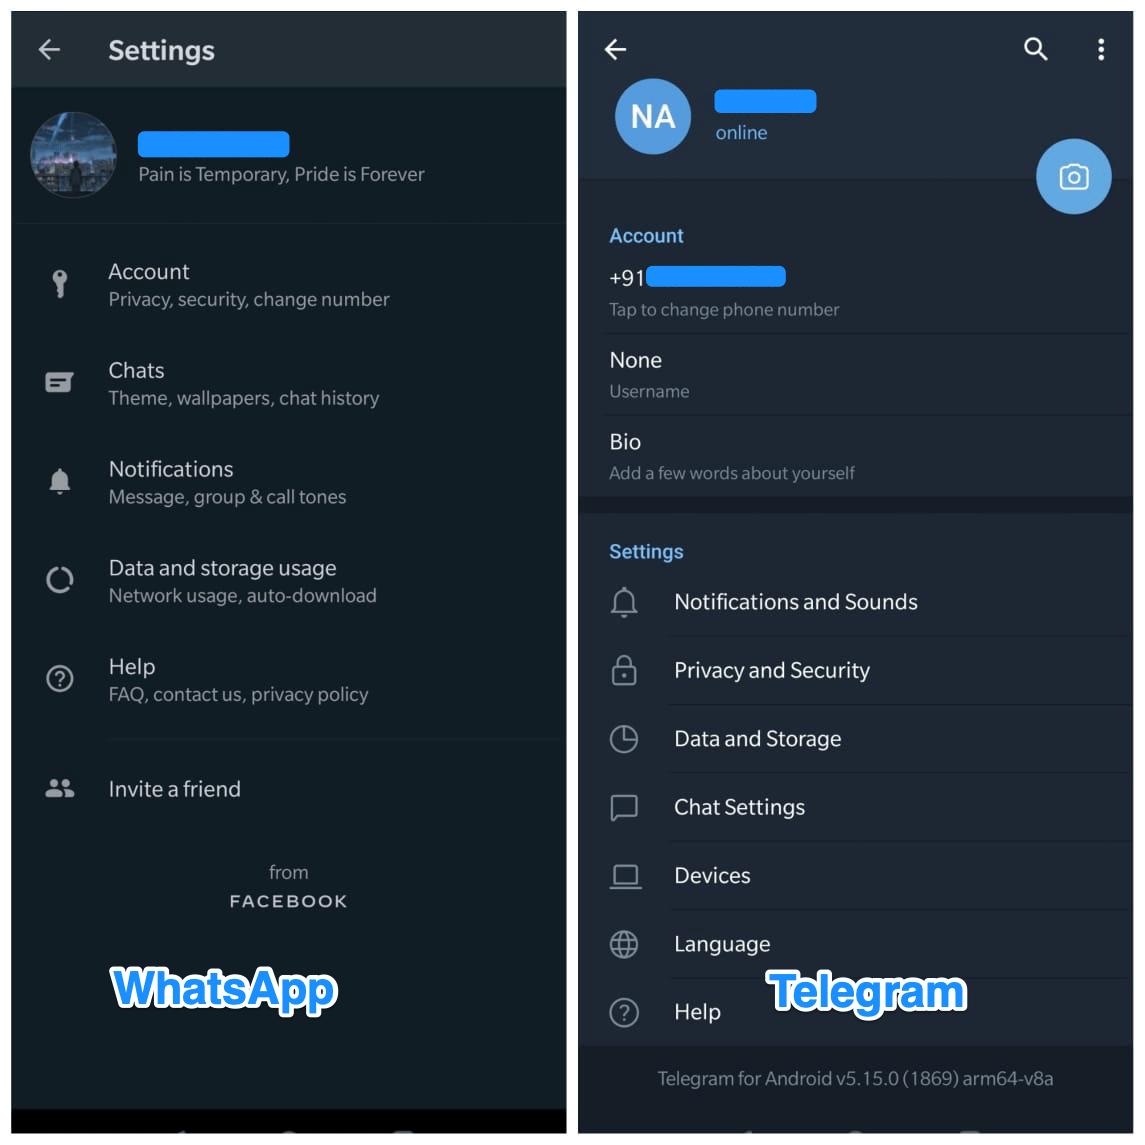 WhatsApp_and_telegram_Settings